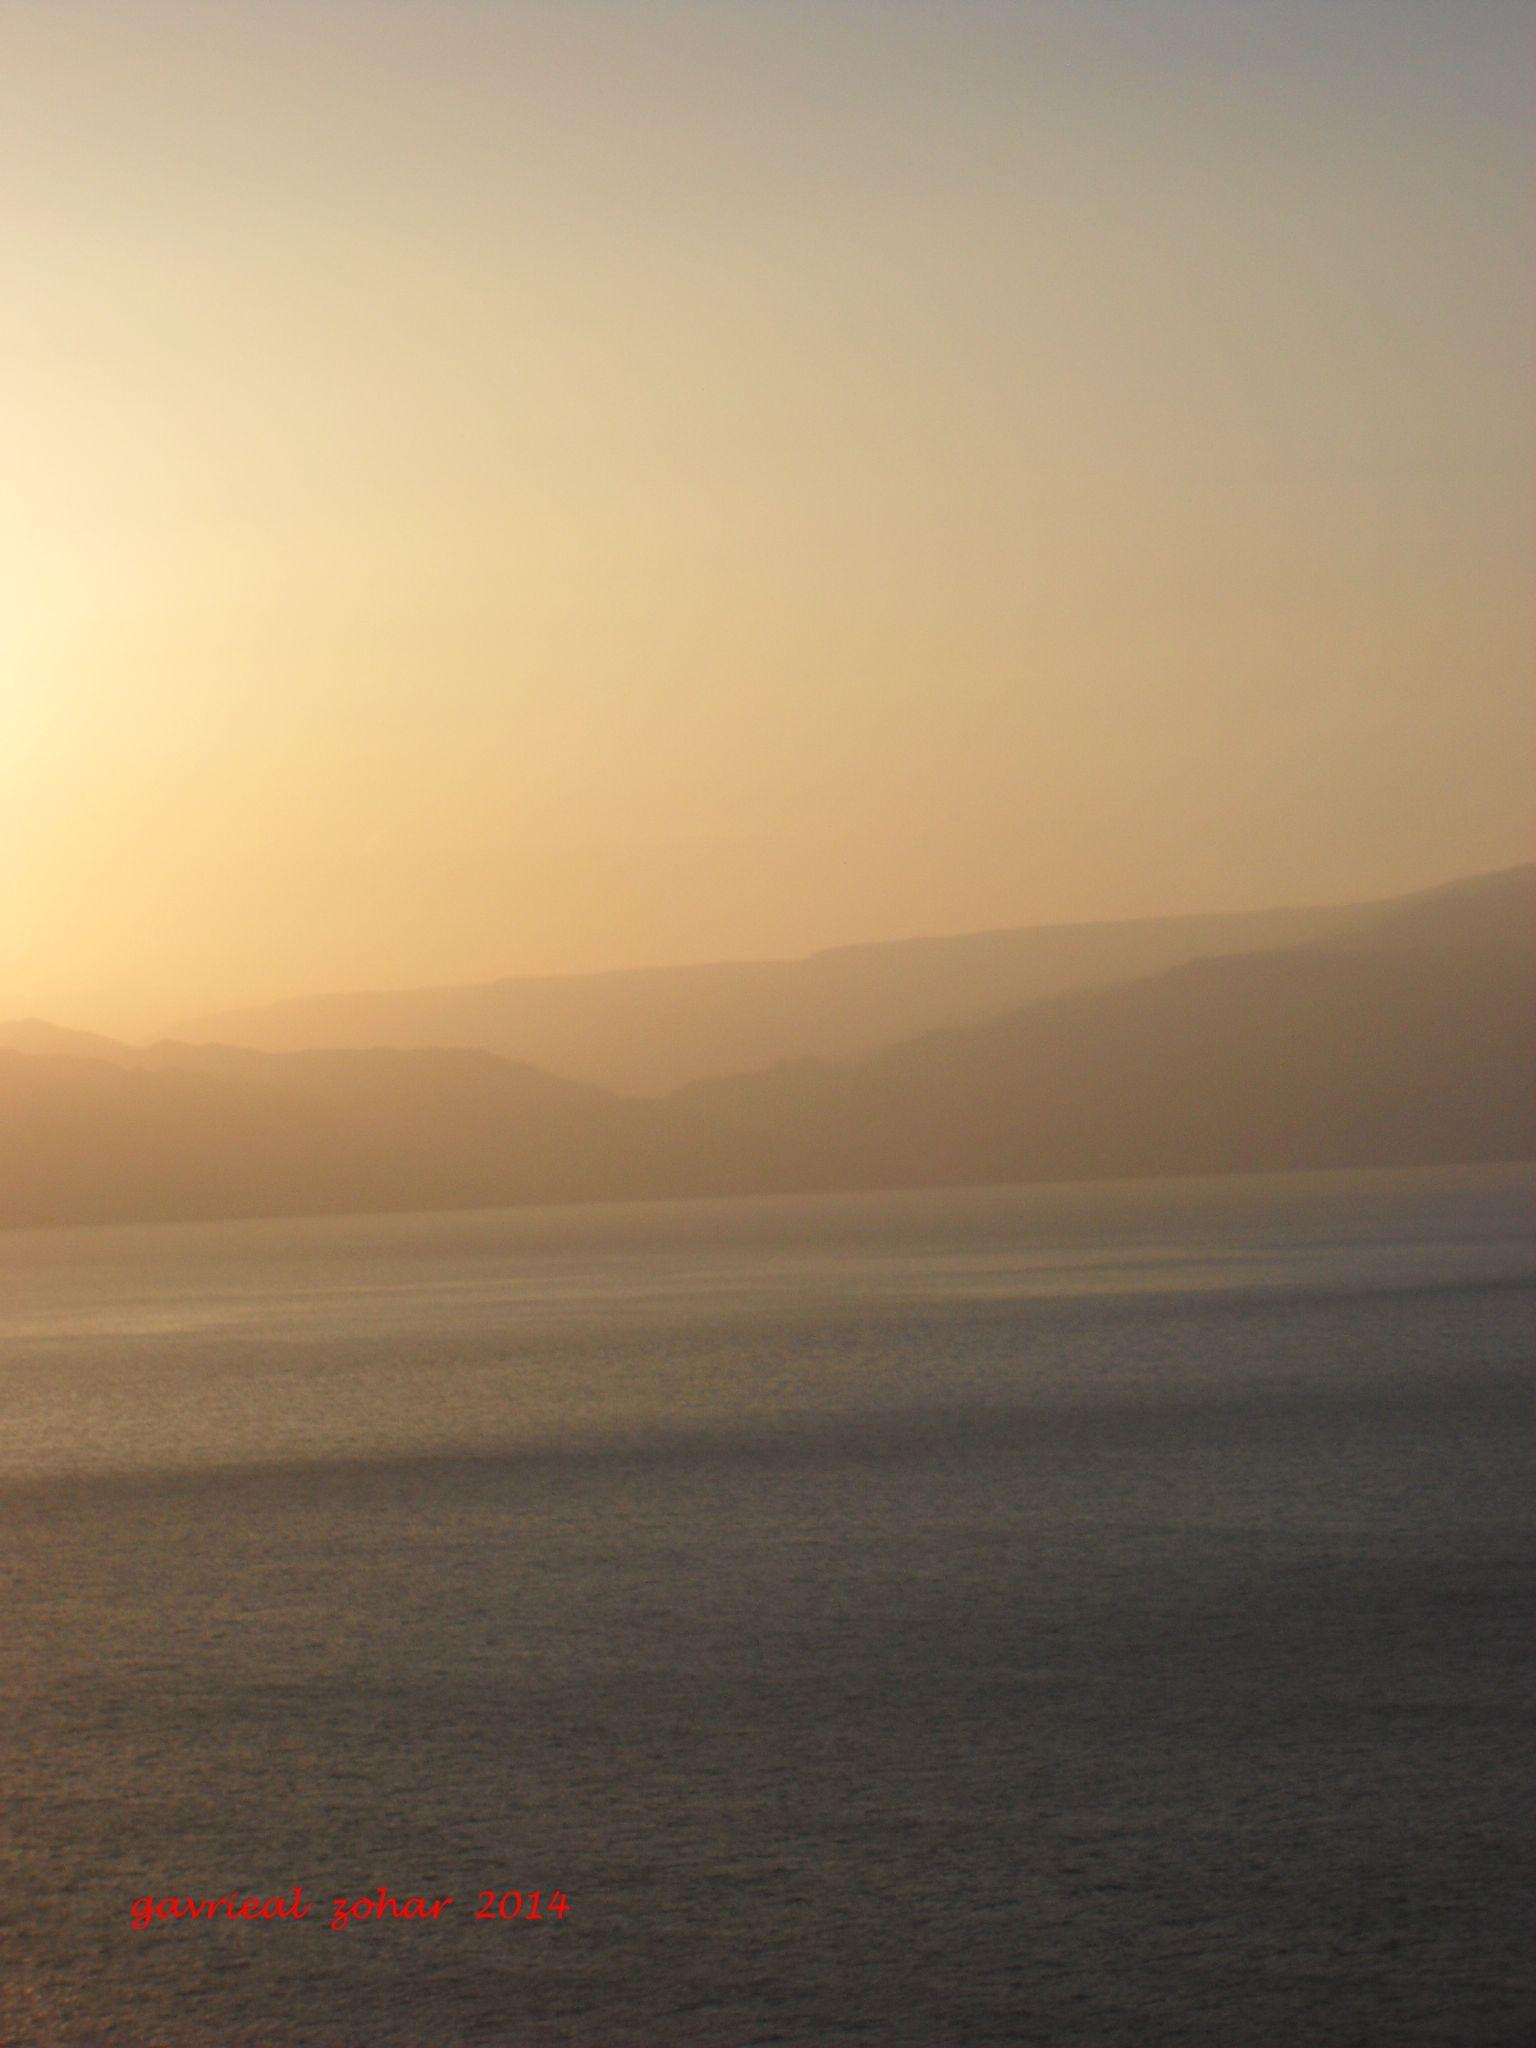 sunrise in the Jordenyen side of the dead sea by gavriealzohar